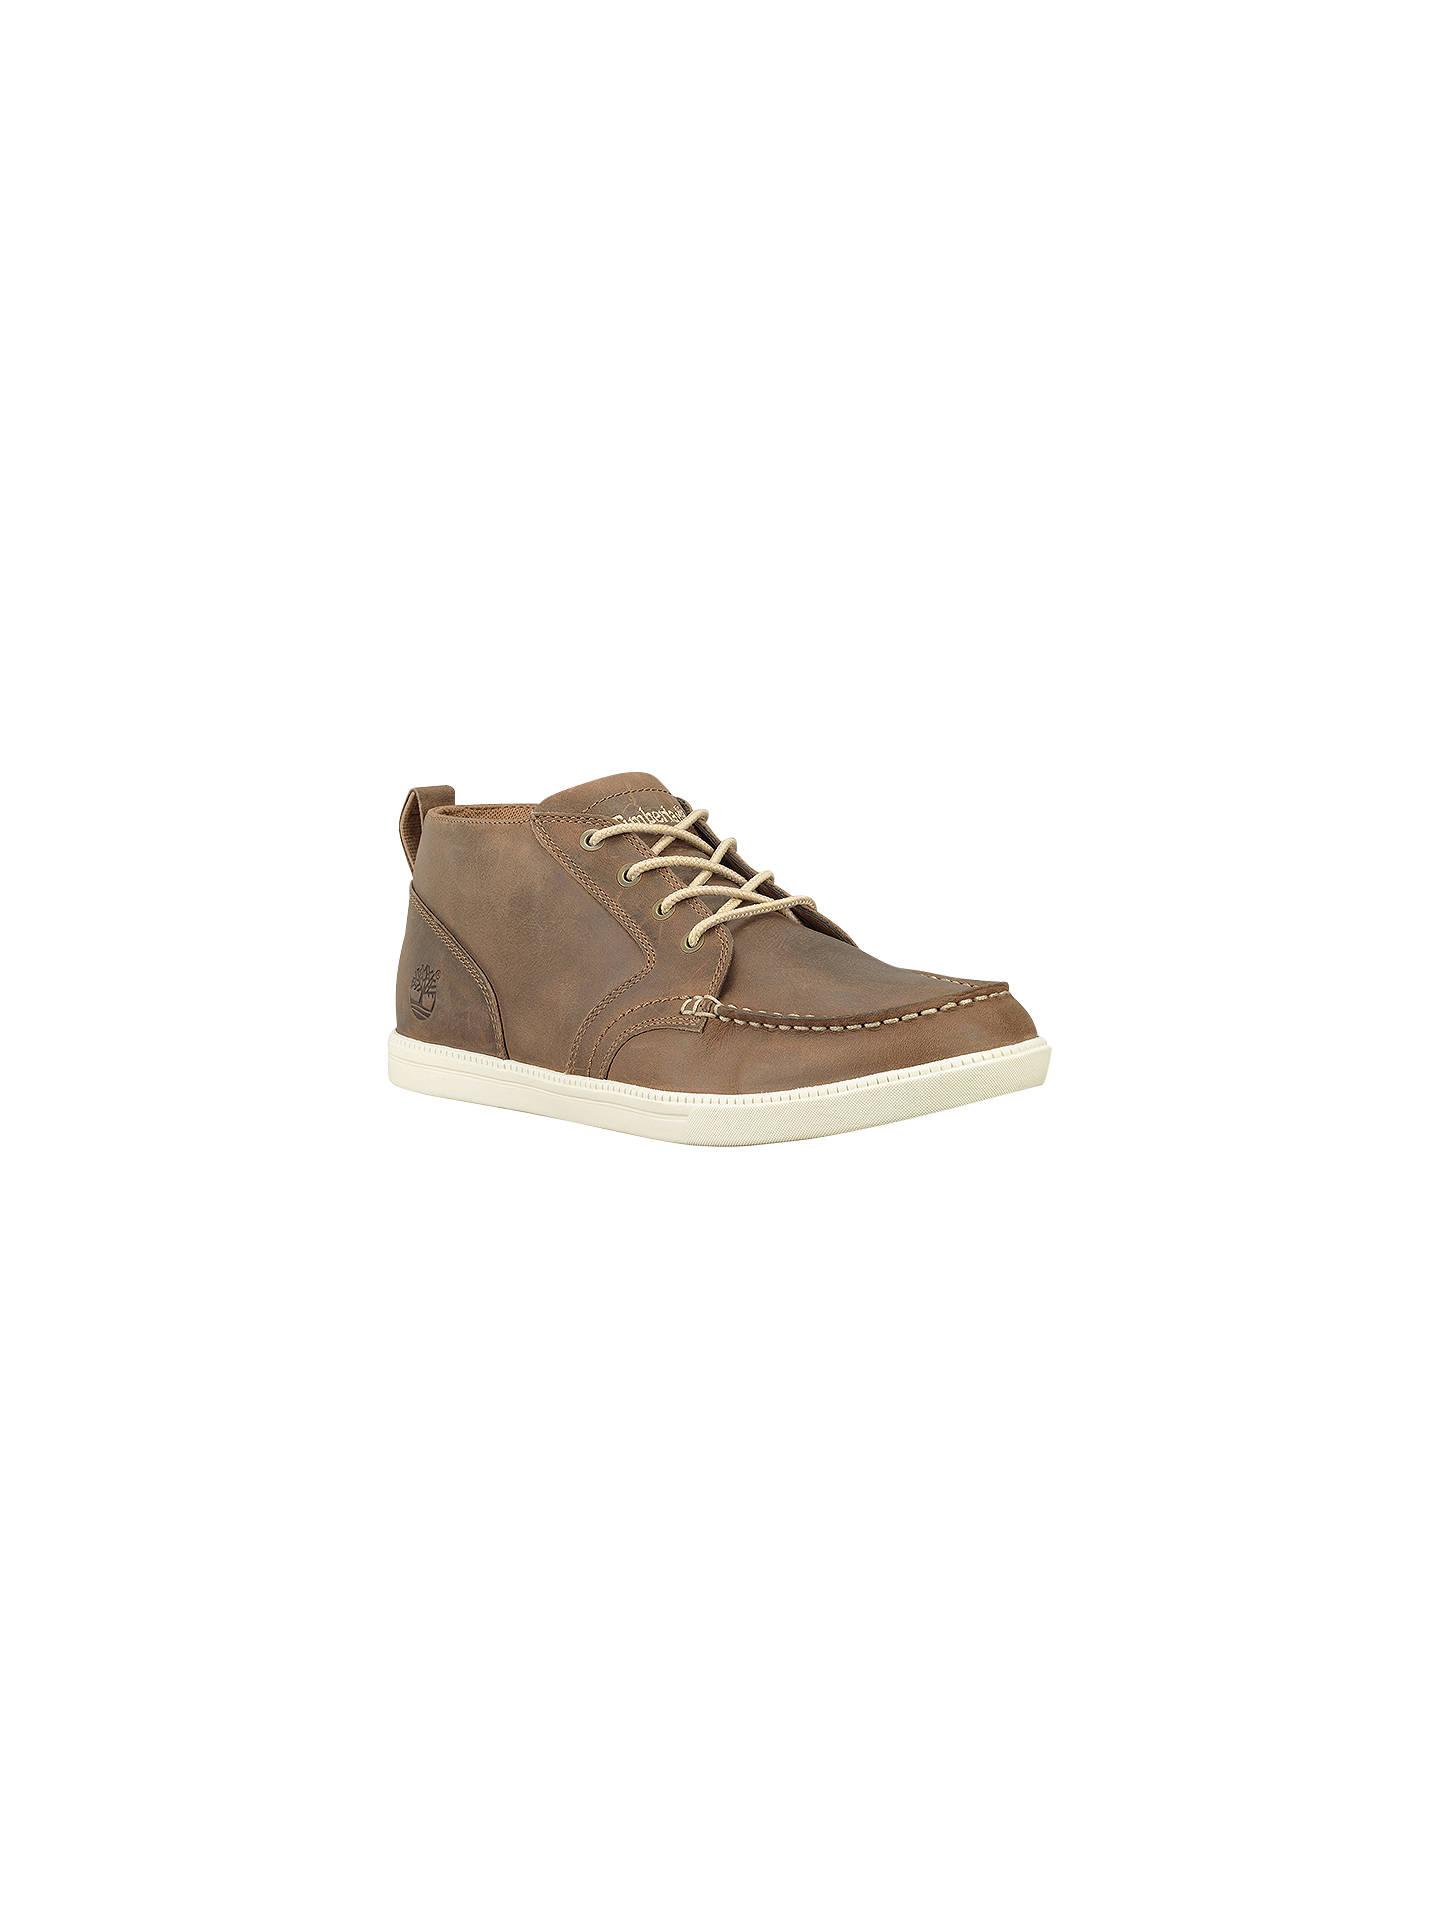 Timberland EK Newmarket Fulk Chukka Boots at John Lewis